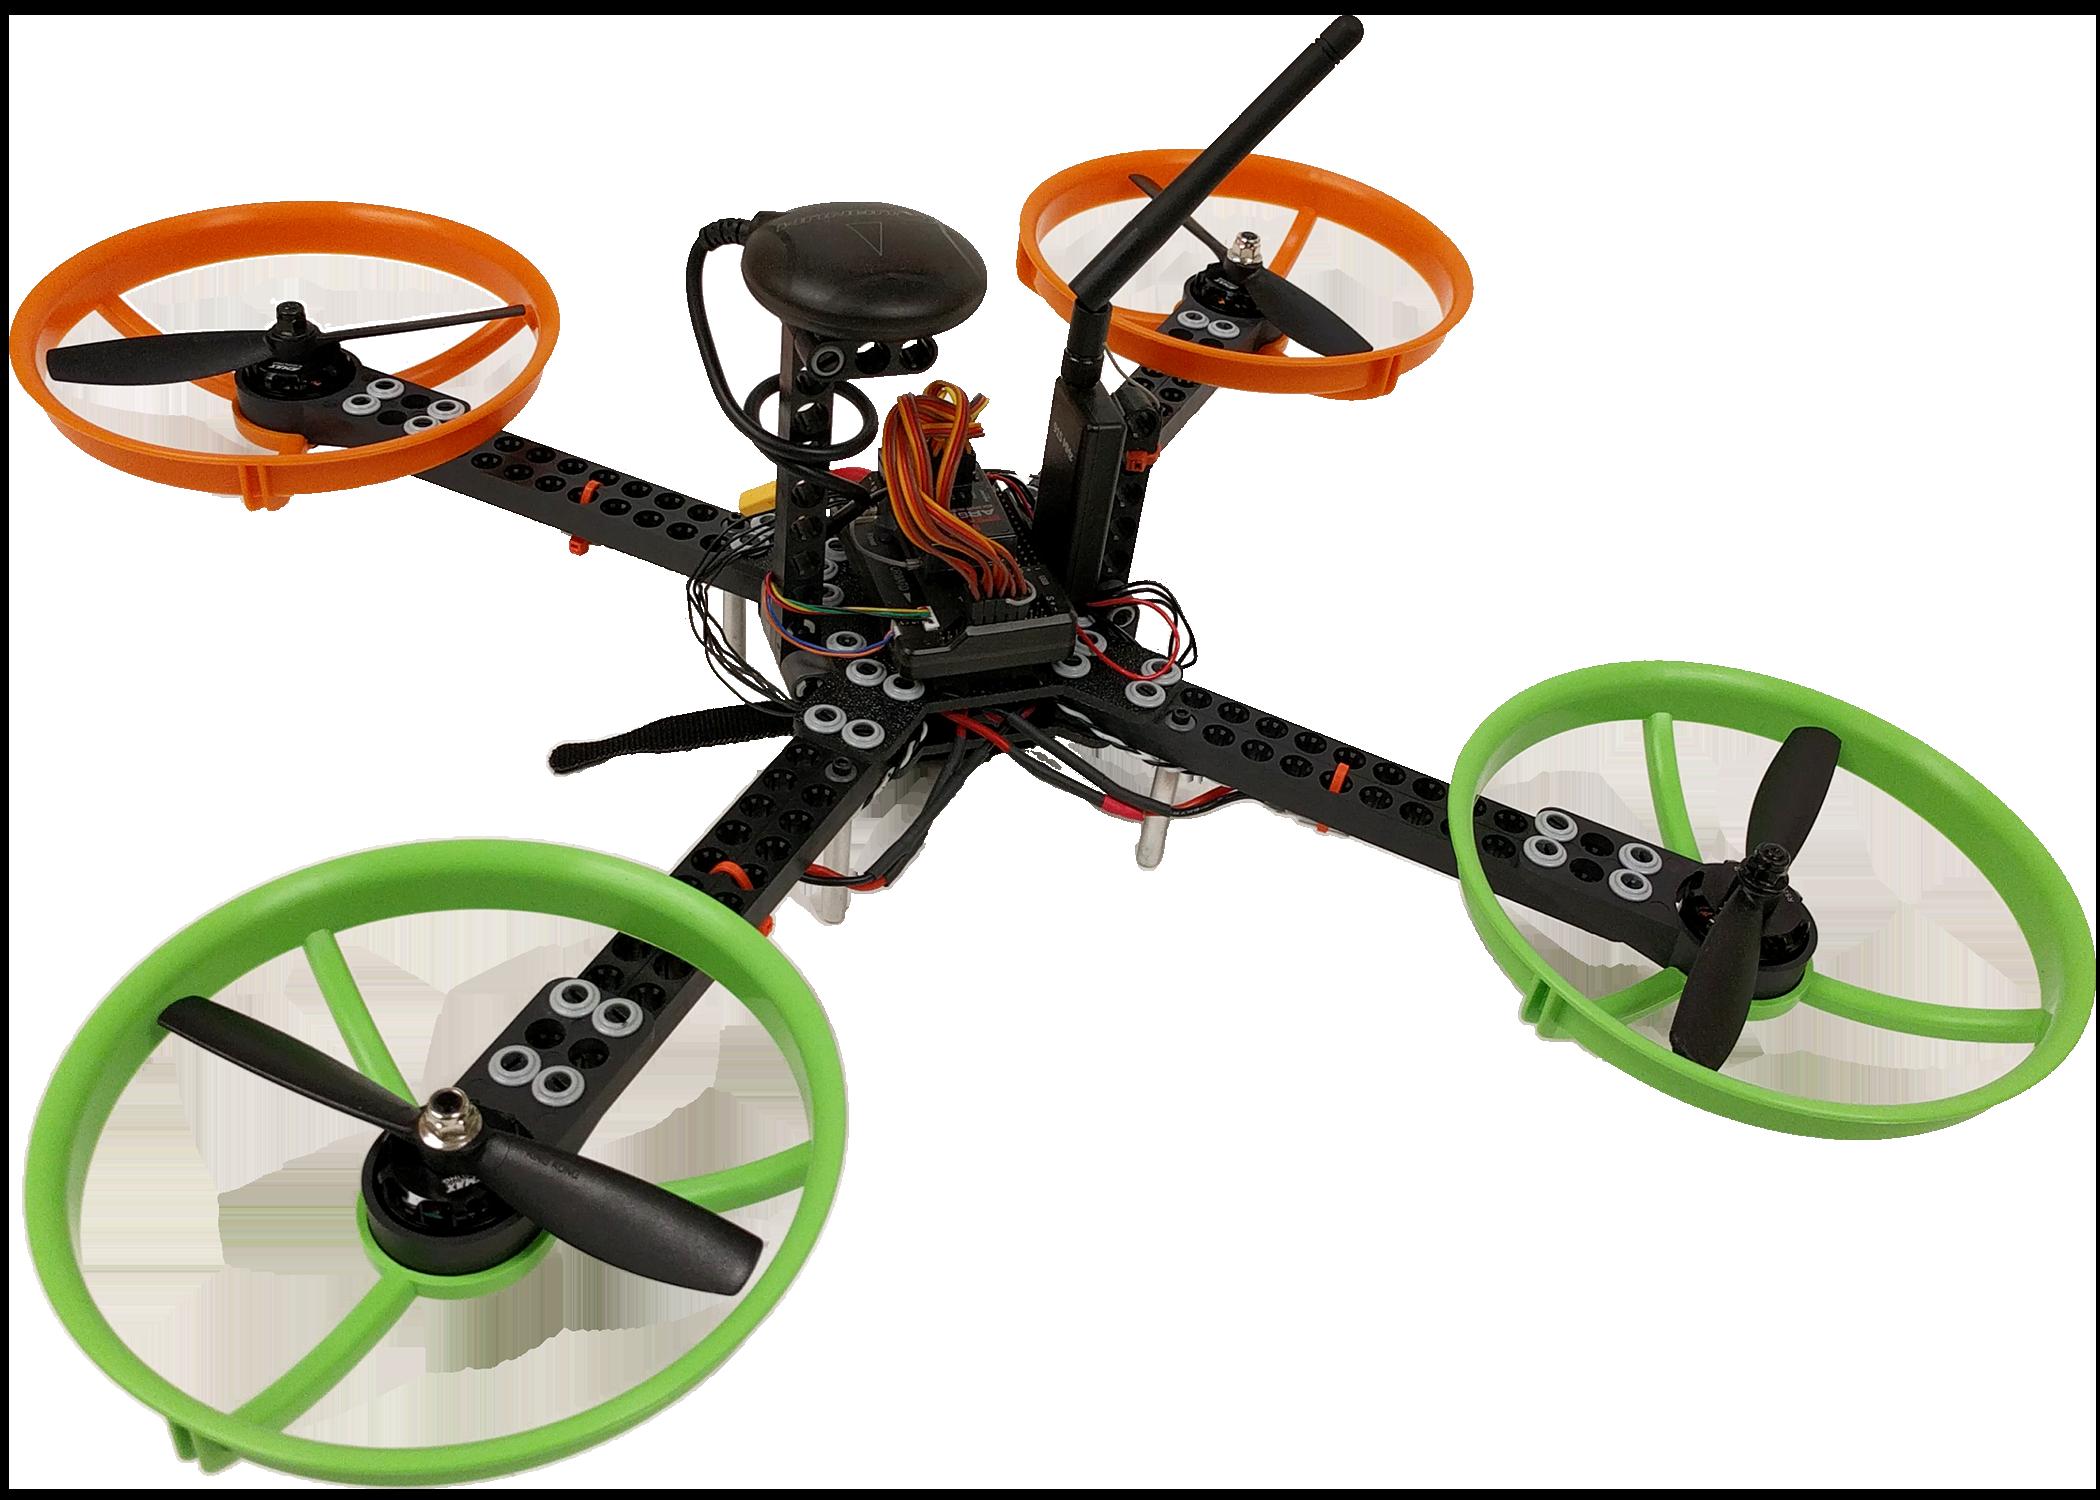 STEM UAV Drone Lab Image